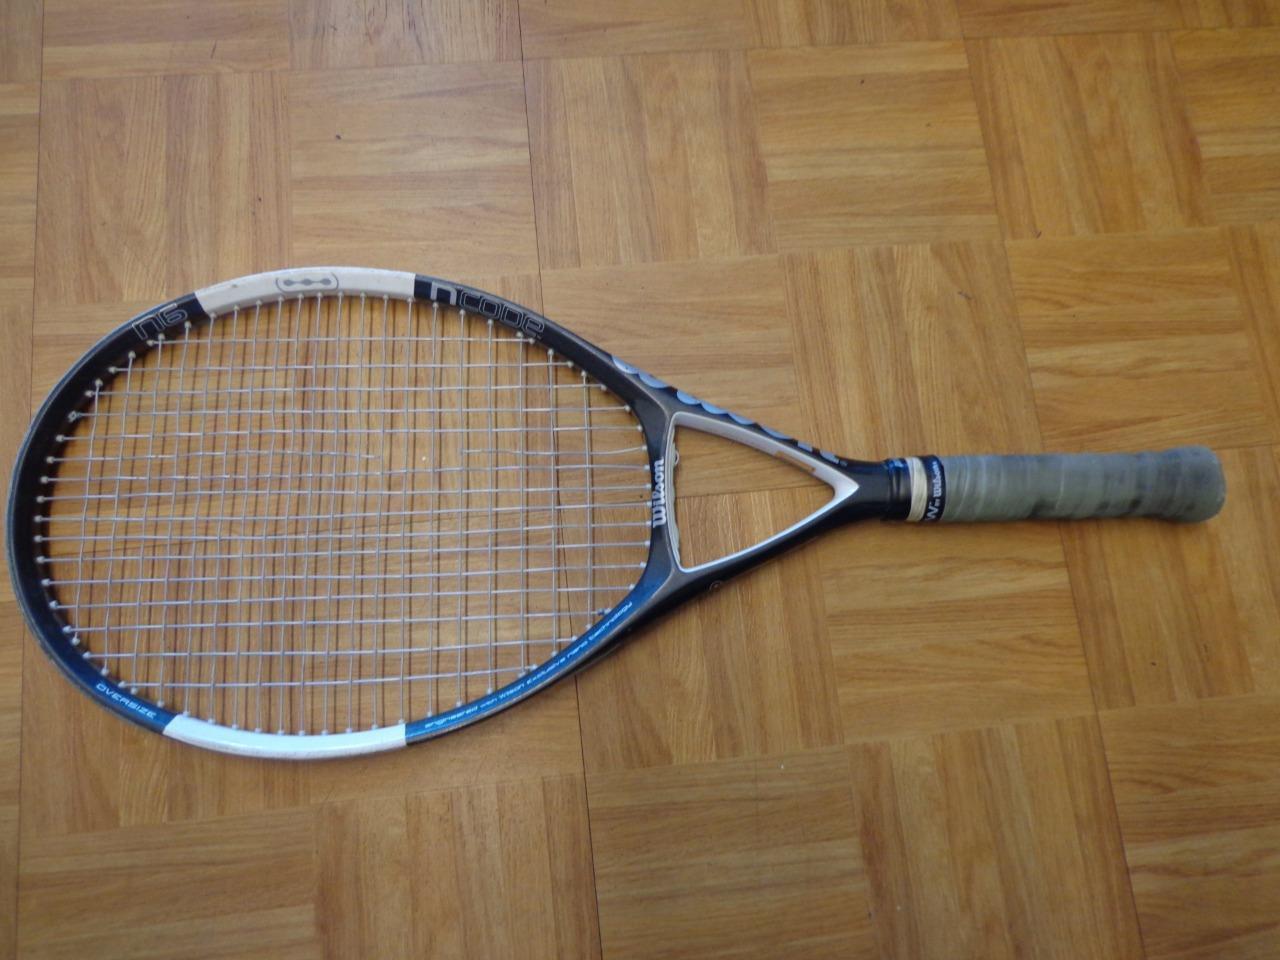 Wilson NCode N 6 Oversize 110 4 1 2 grip Tennis Racquet